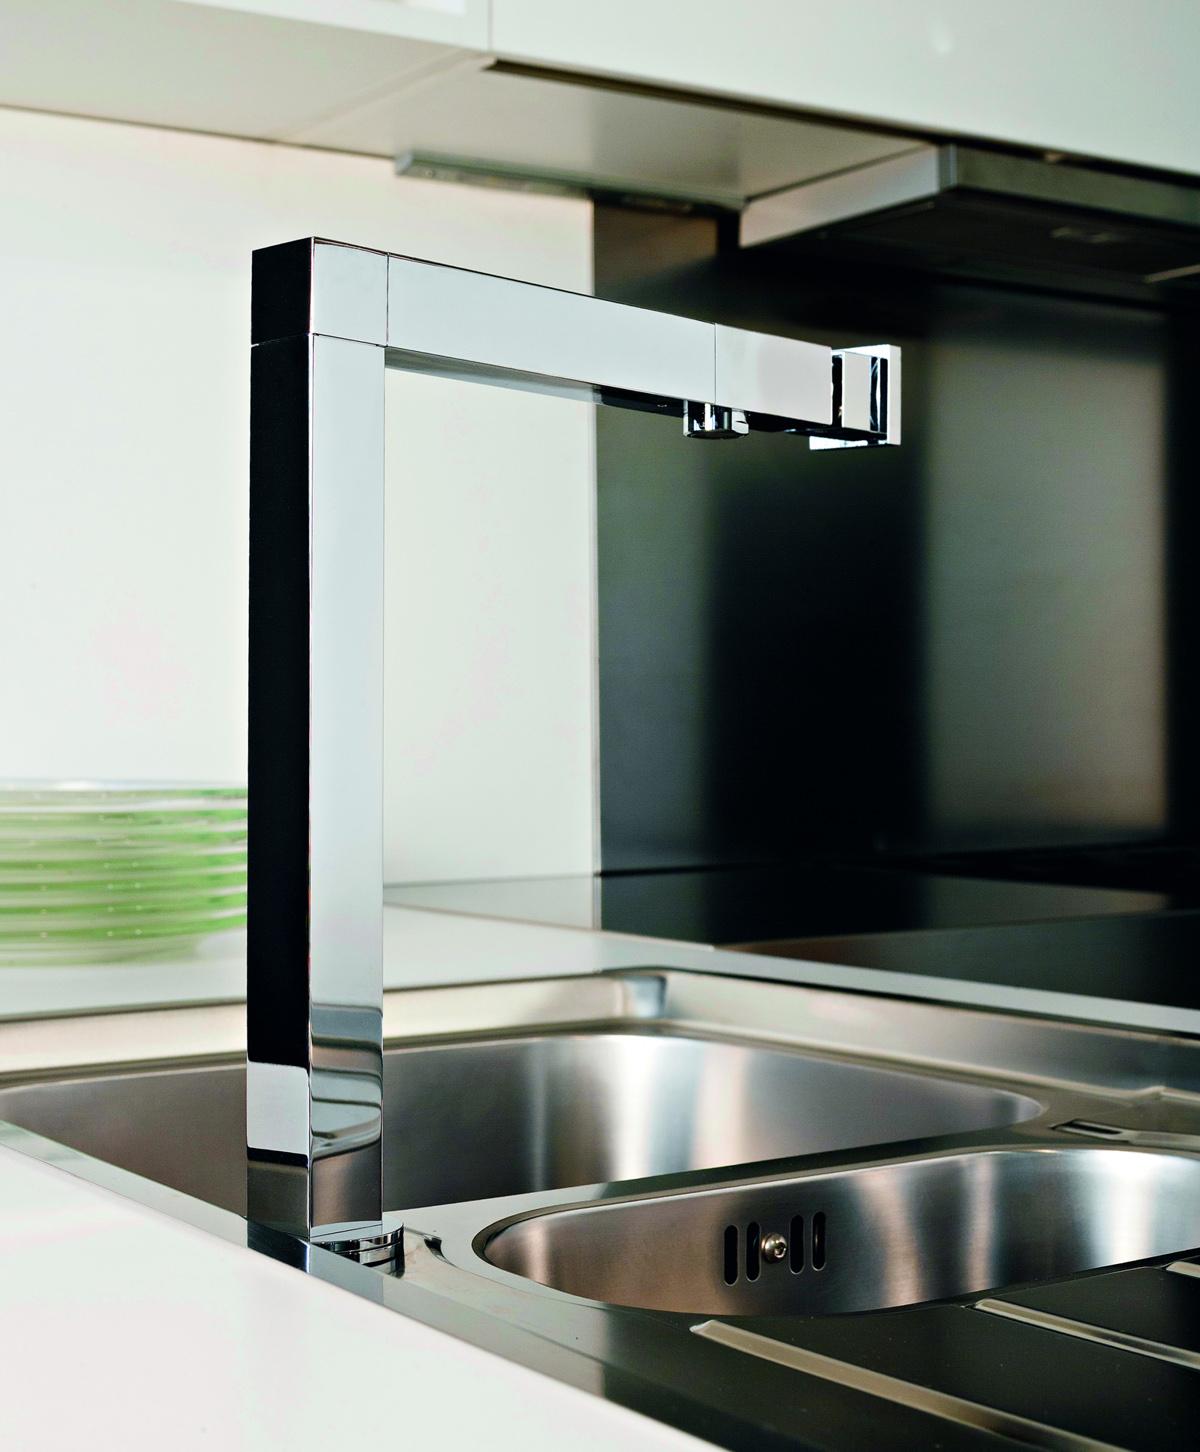 Rubinetterie cucina archivi arredobagno news - Rubinetti x cucina ...